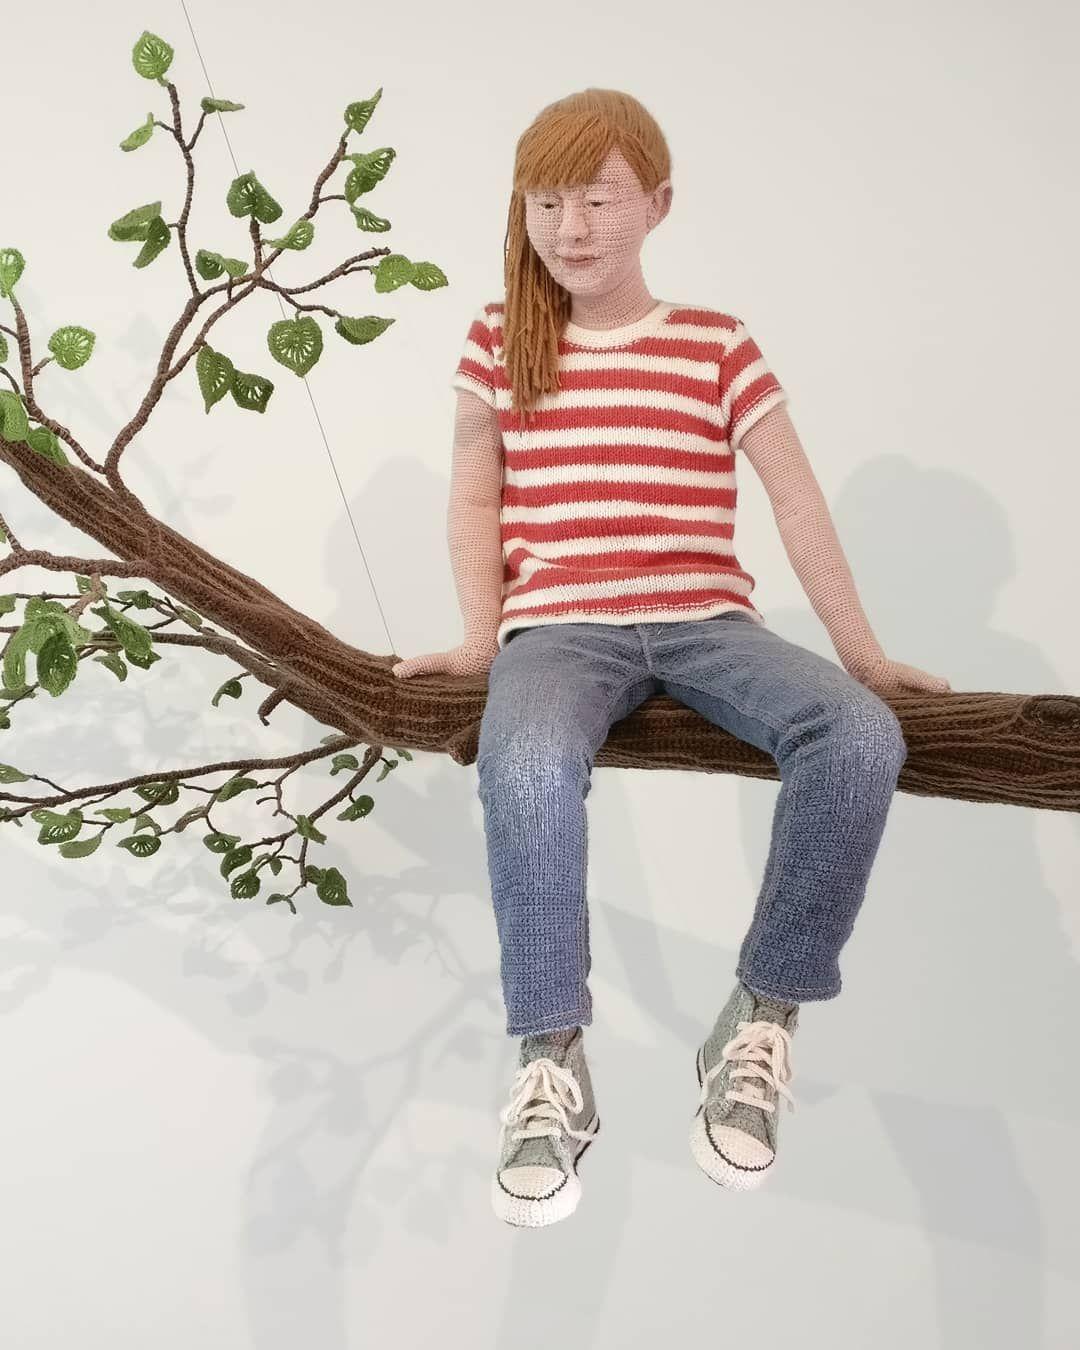 crochet sculpture girl tree